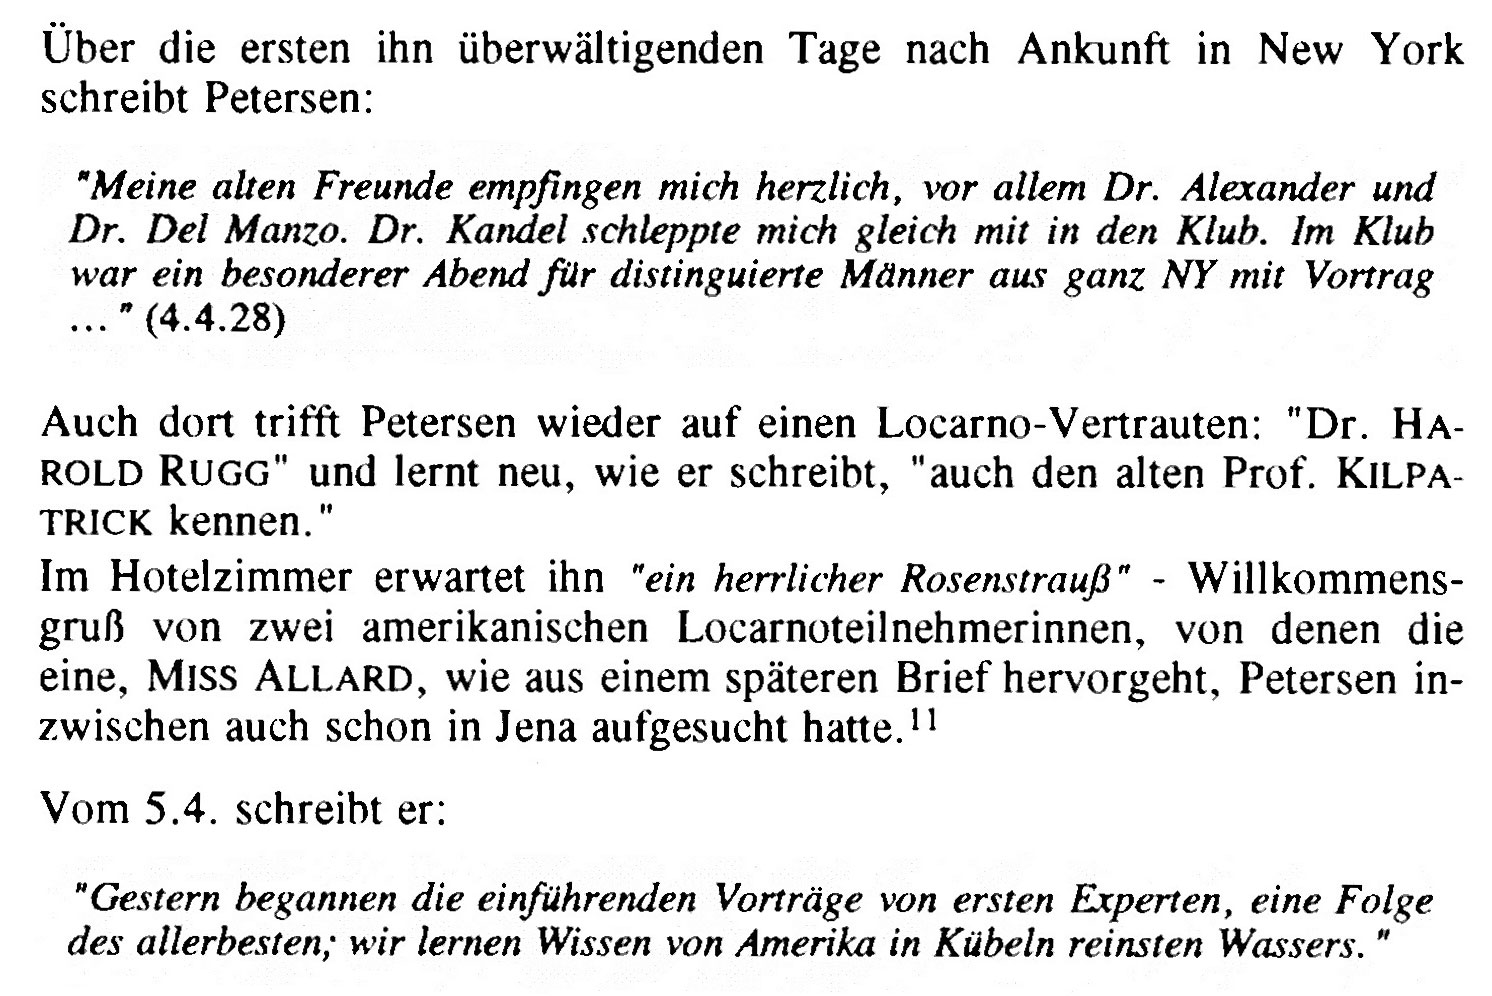 Figure 1: Peter Petersen in the USA (Kluge, 1992, p. 204)